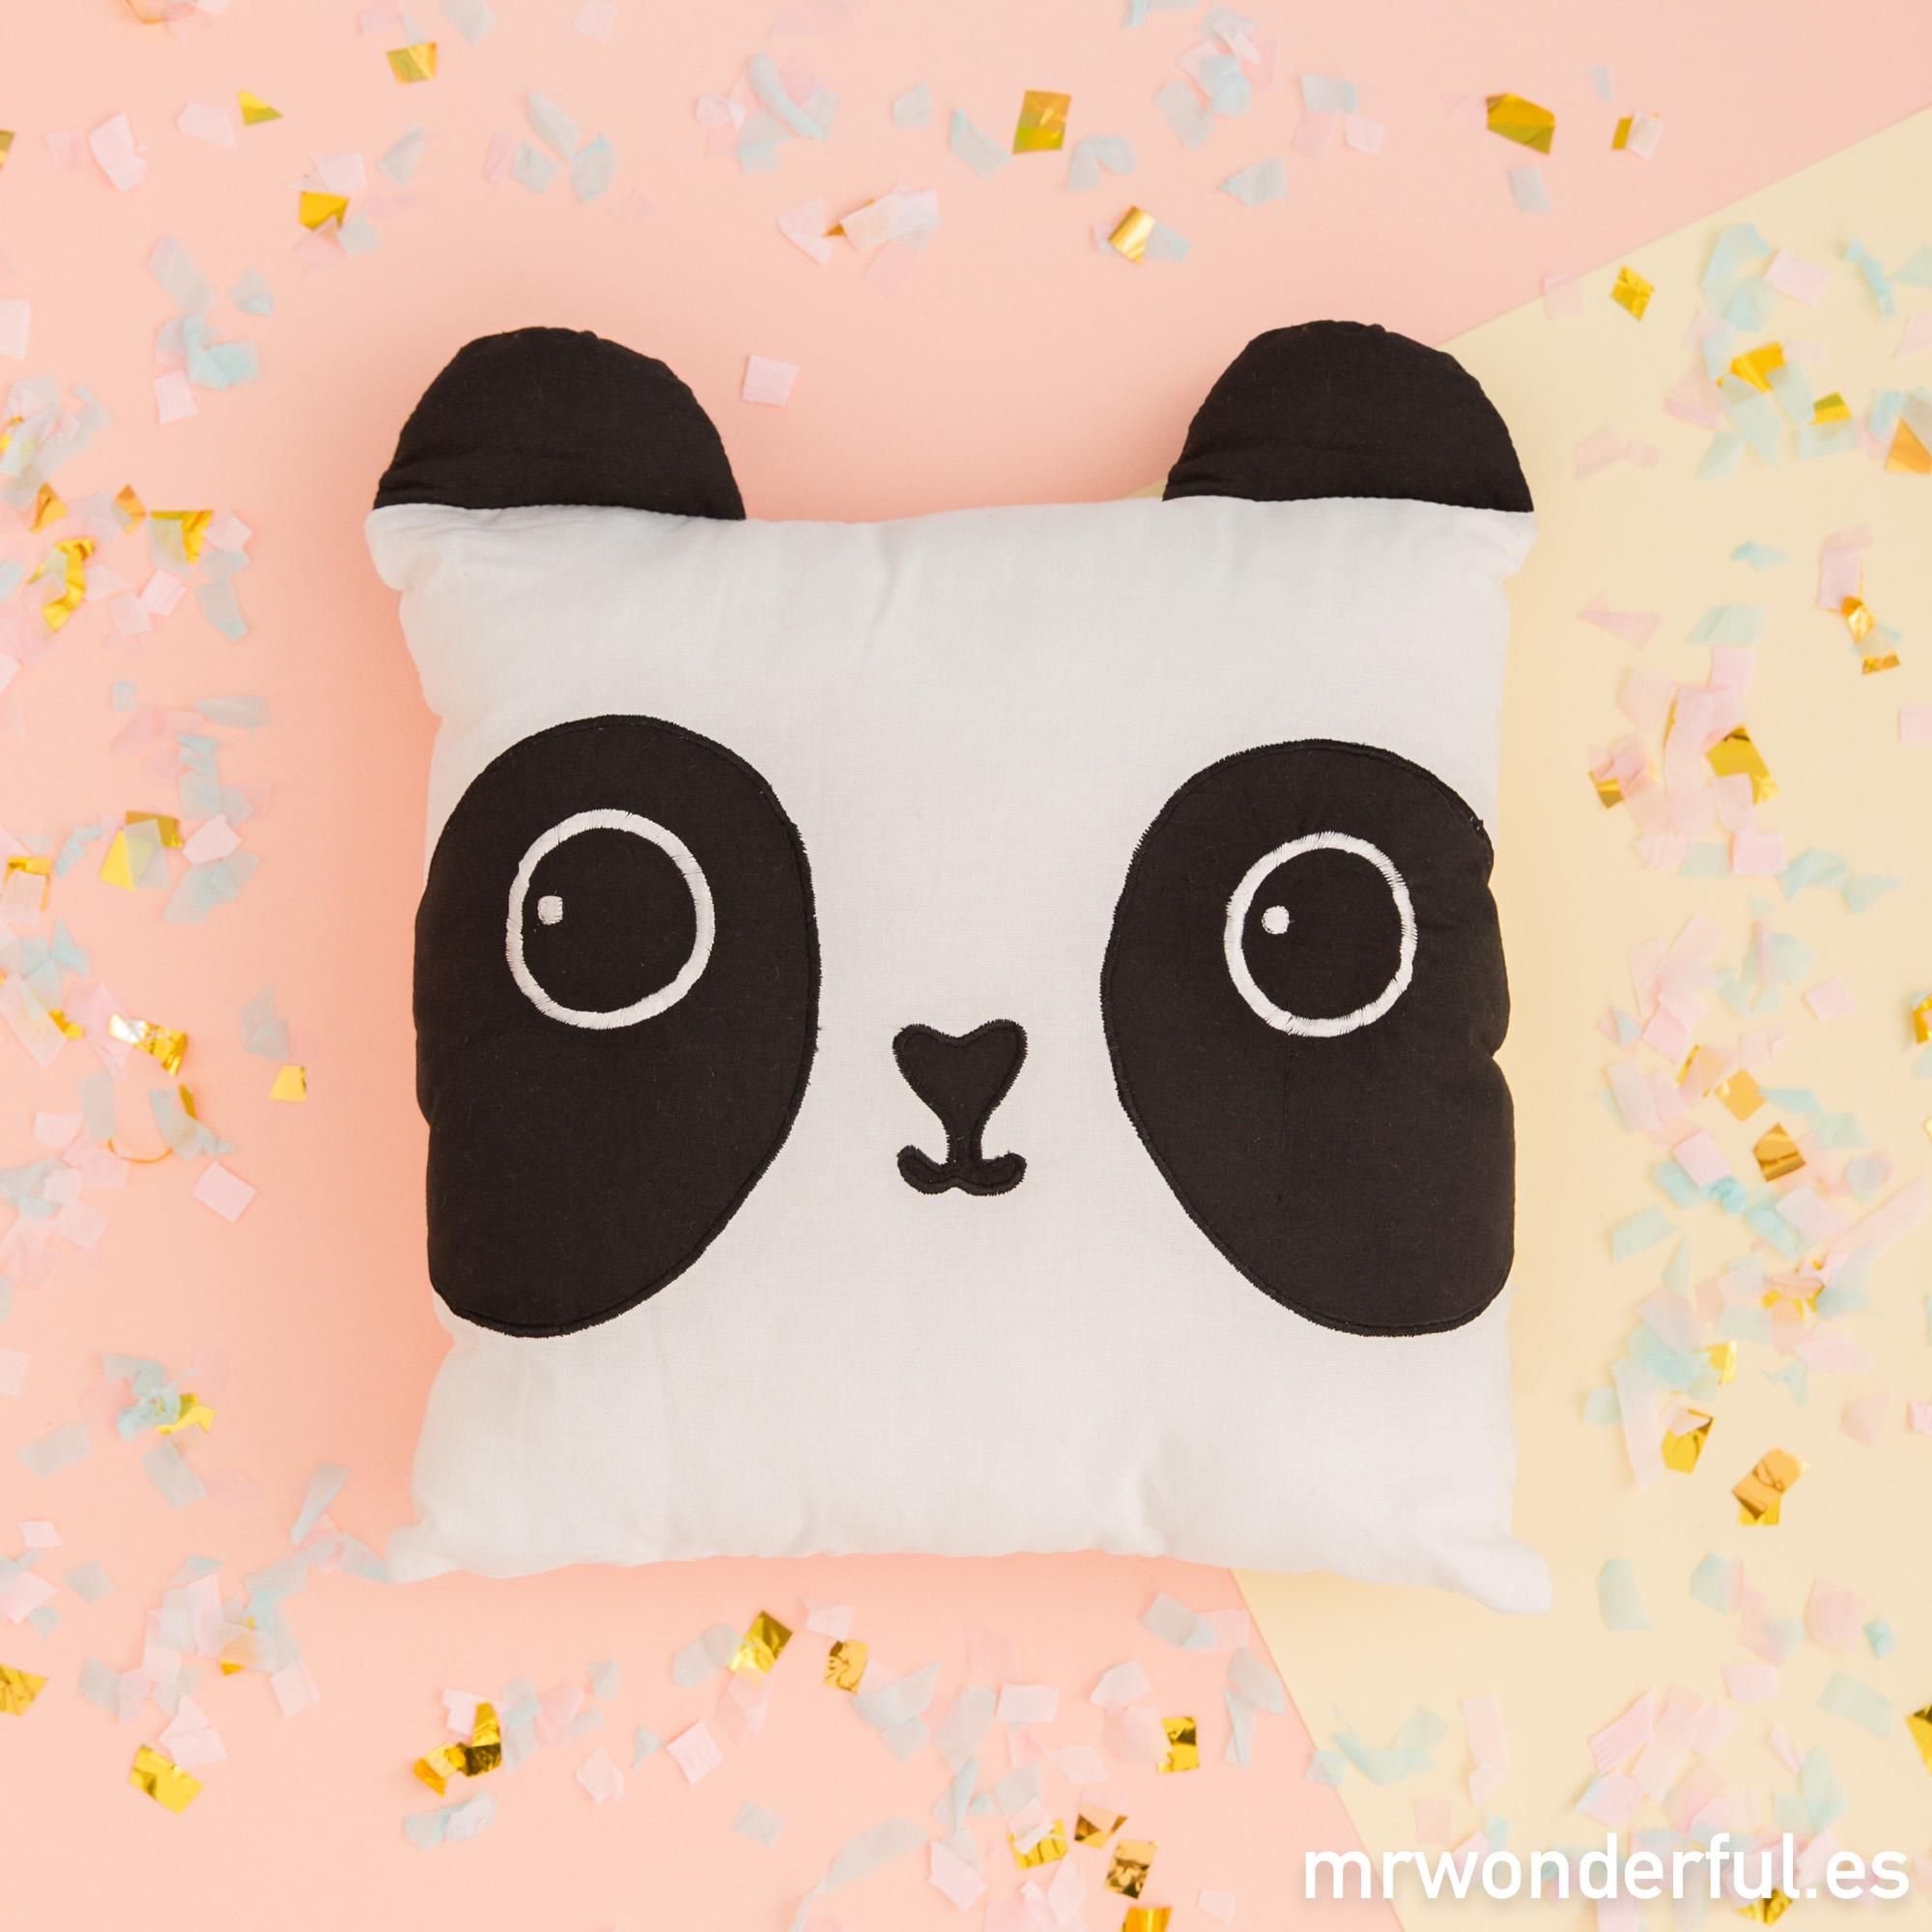 mrwonderful_pra03089un_cojin-infantil-panda-1-editar